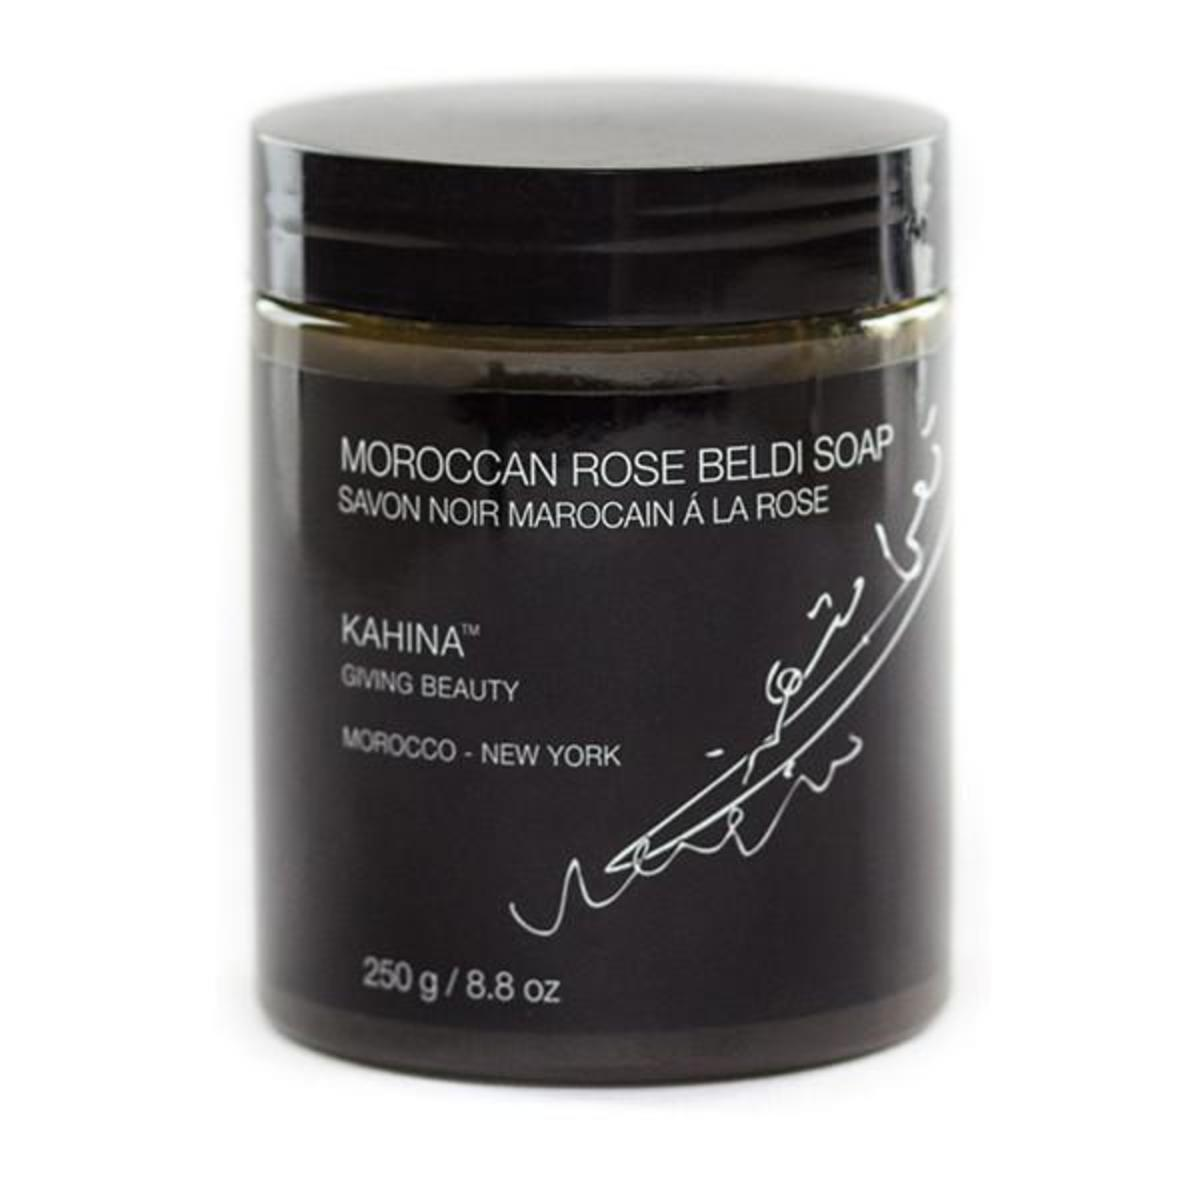 Kahina Giving Beauty Moroccan Rose Beldi Soap